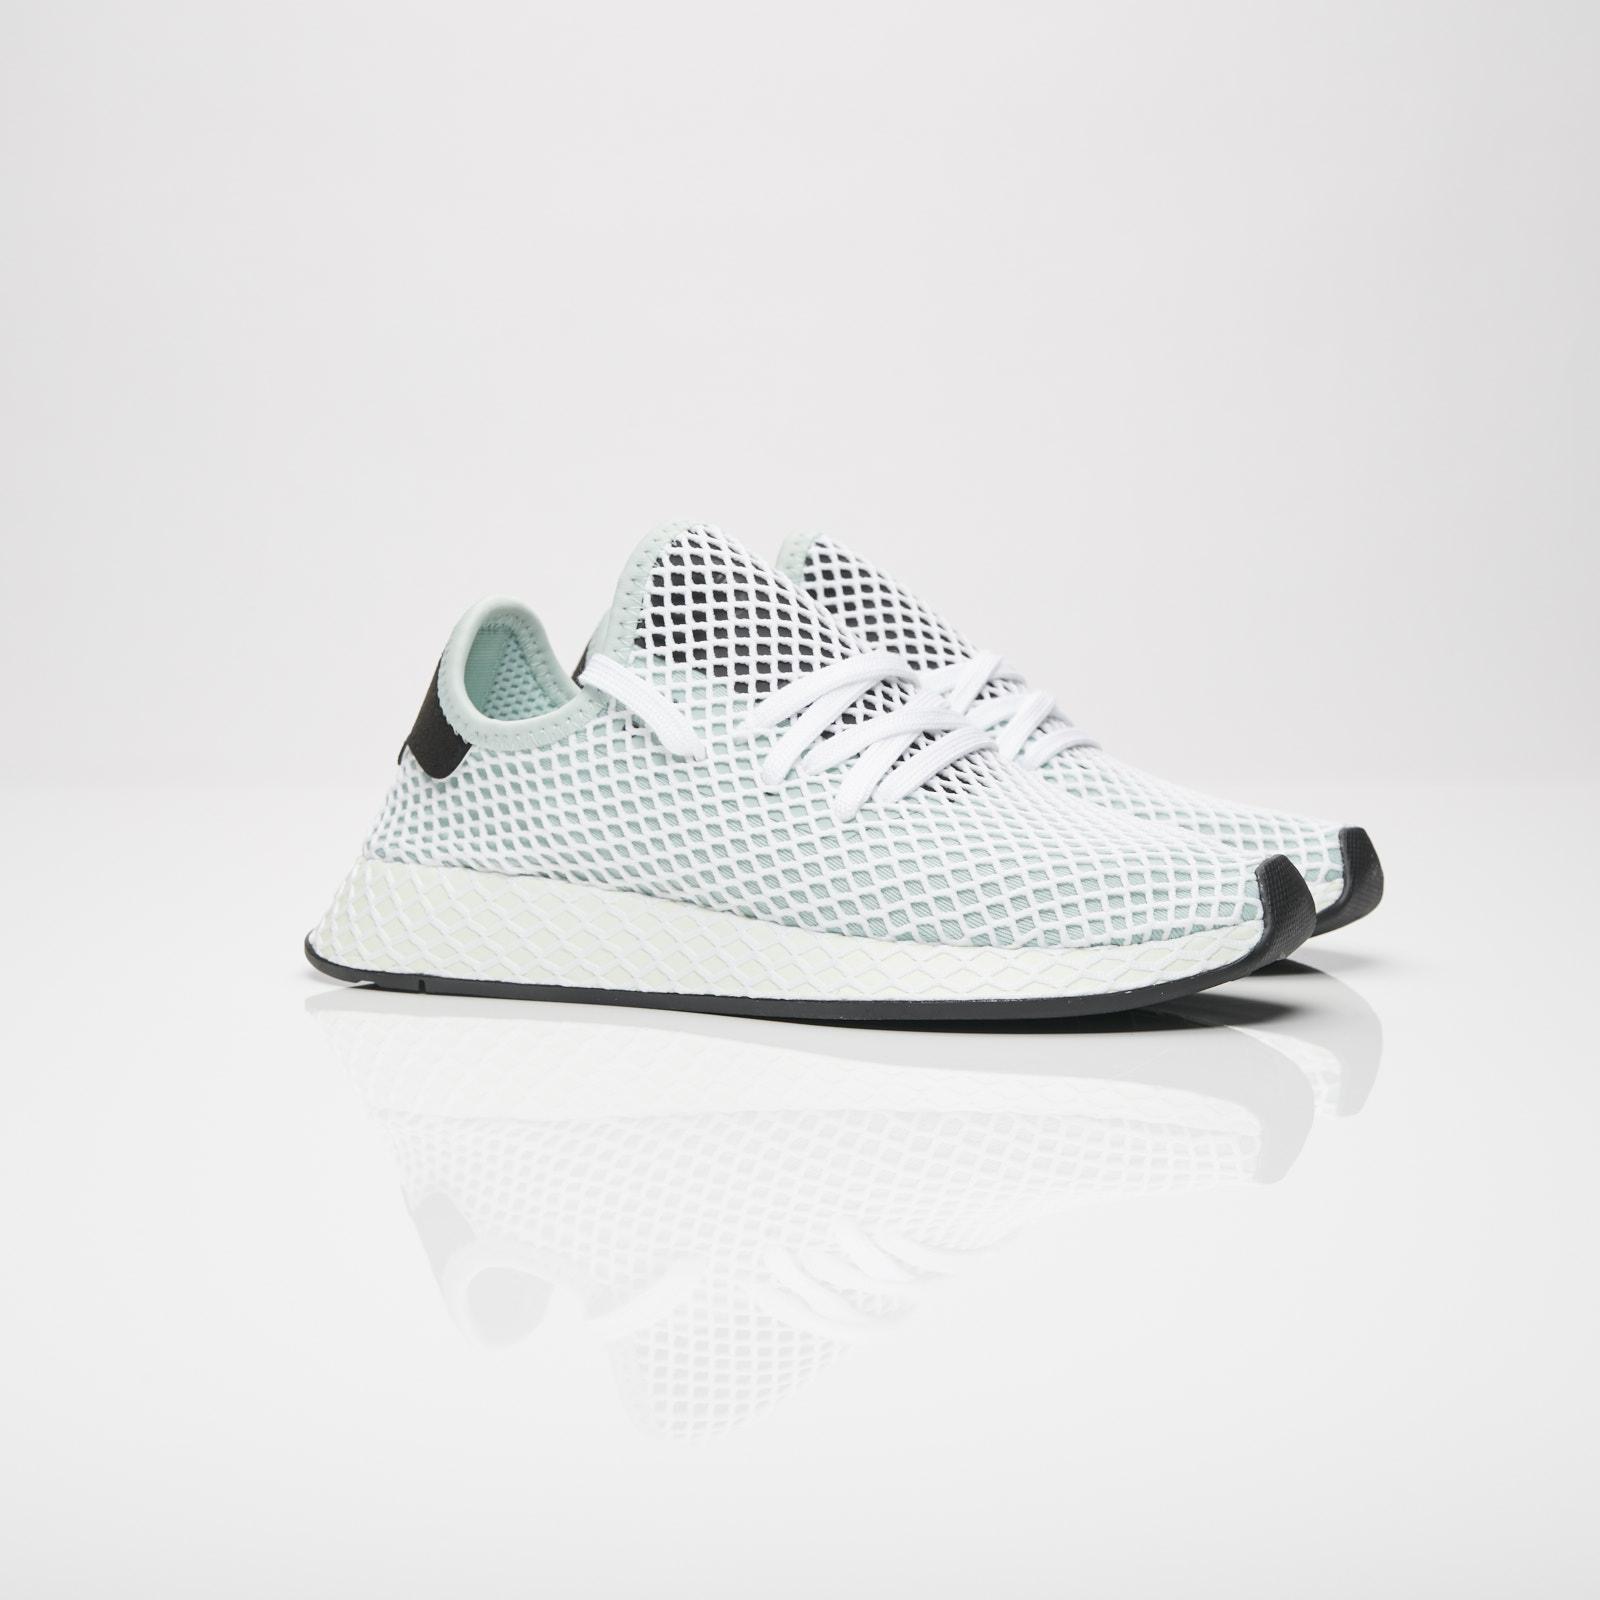 9fcaf75a3 adidas Deerupt Runner W - Cq2911 - Sneakersnstuff